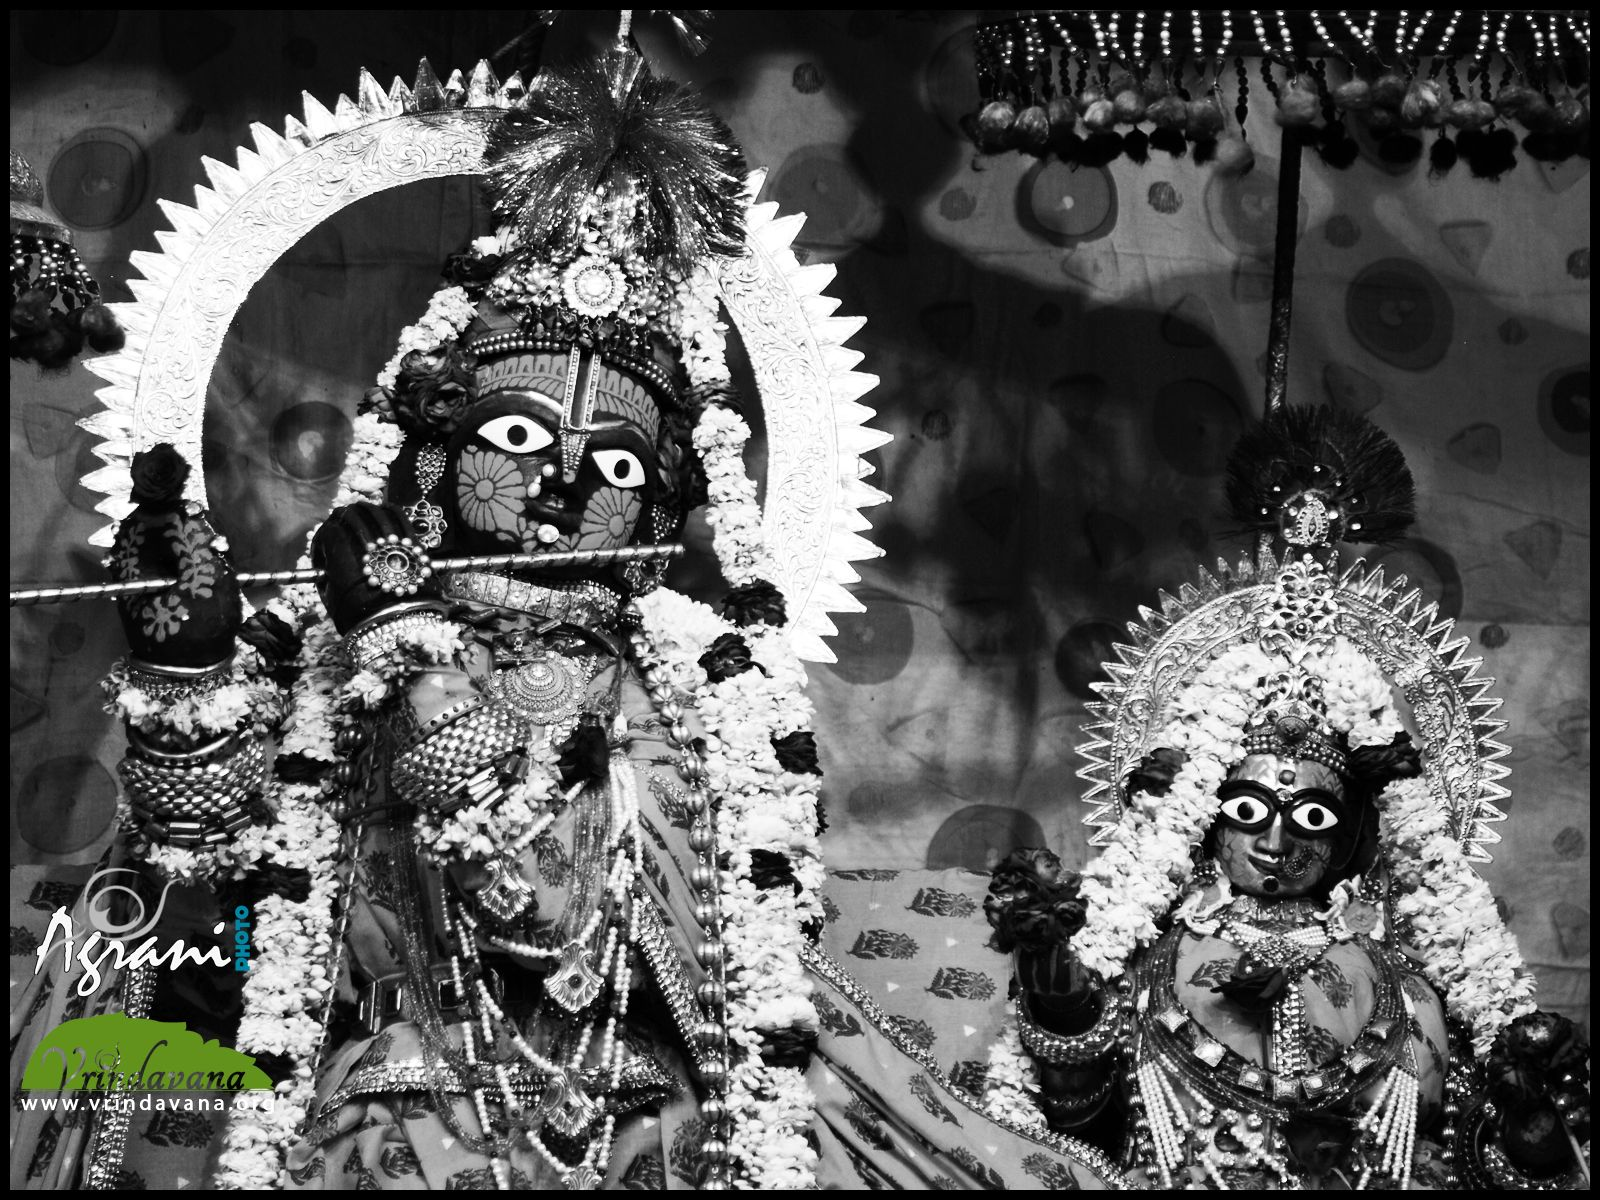 Sri Sri Radha Govindadevji, Jaipur  Read more at www.vrindavana.org